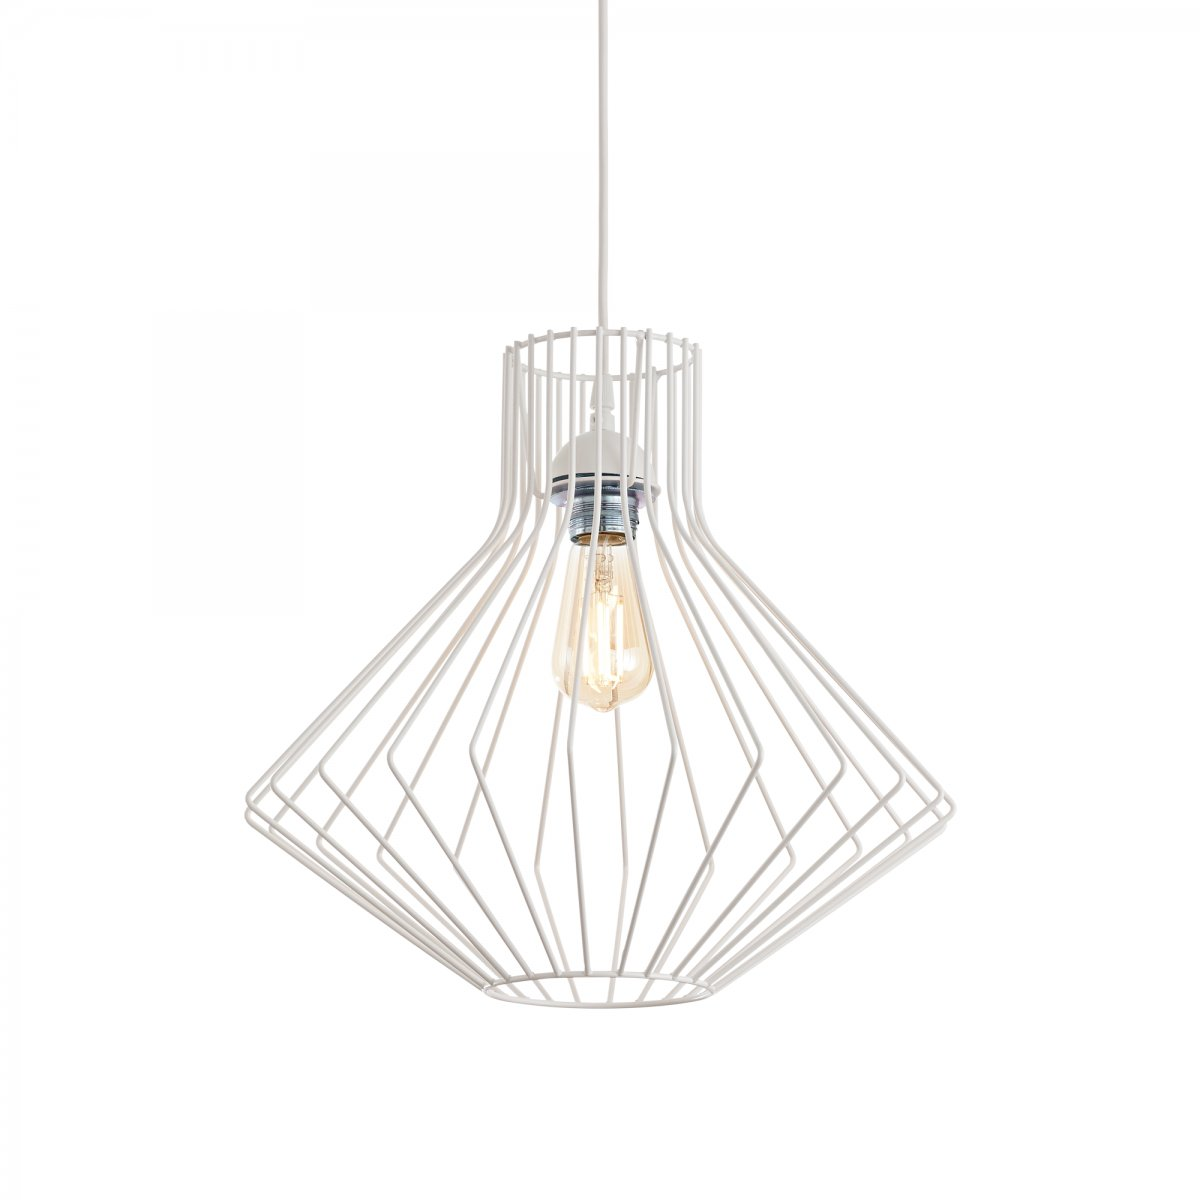 Ideal Lux AMPOLLA-4 SP1 LAMPADA A SOSPENSIONE